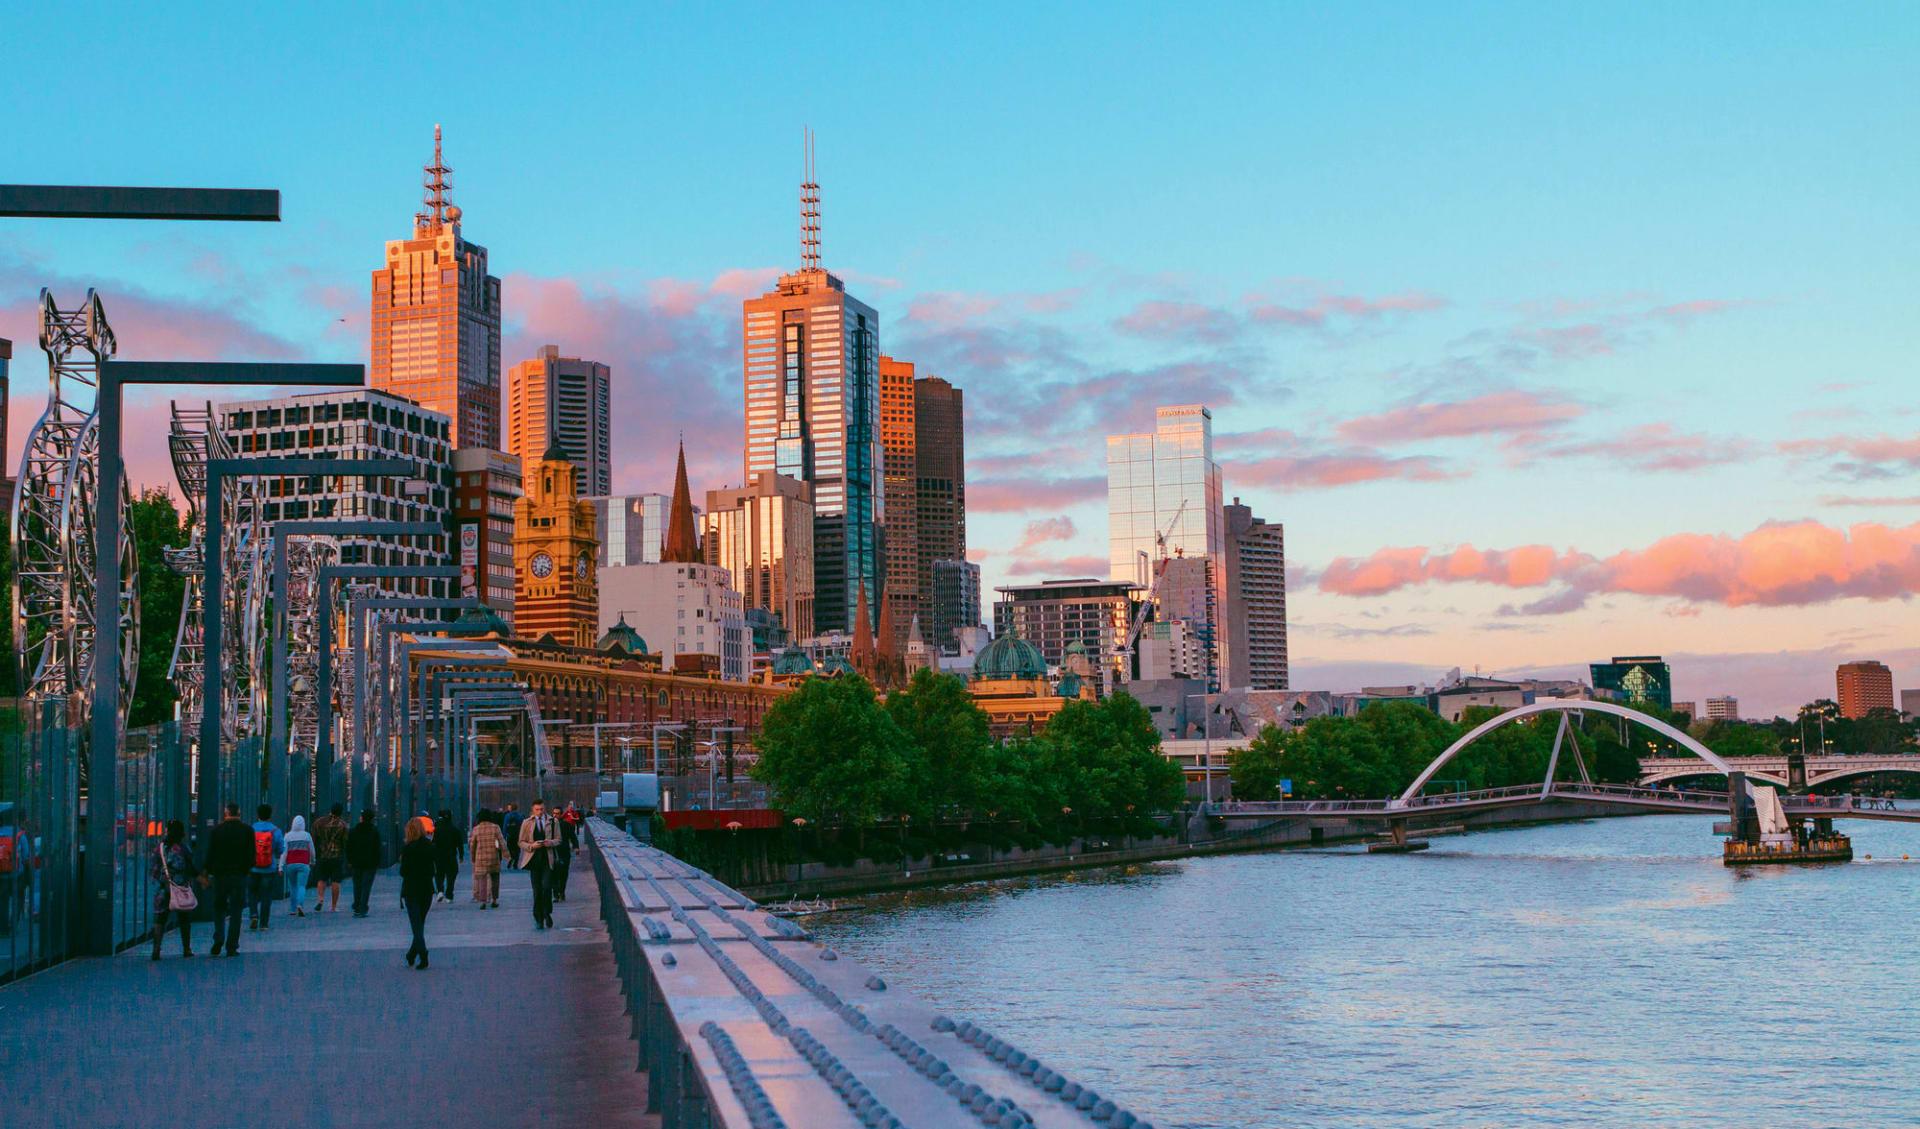 Faszination Australien (AAT Kings) ab Melbourne: Australia - Victoria - Melbourne - Skyline und Boardwalk